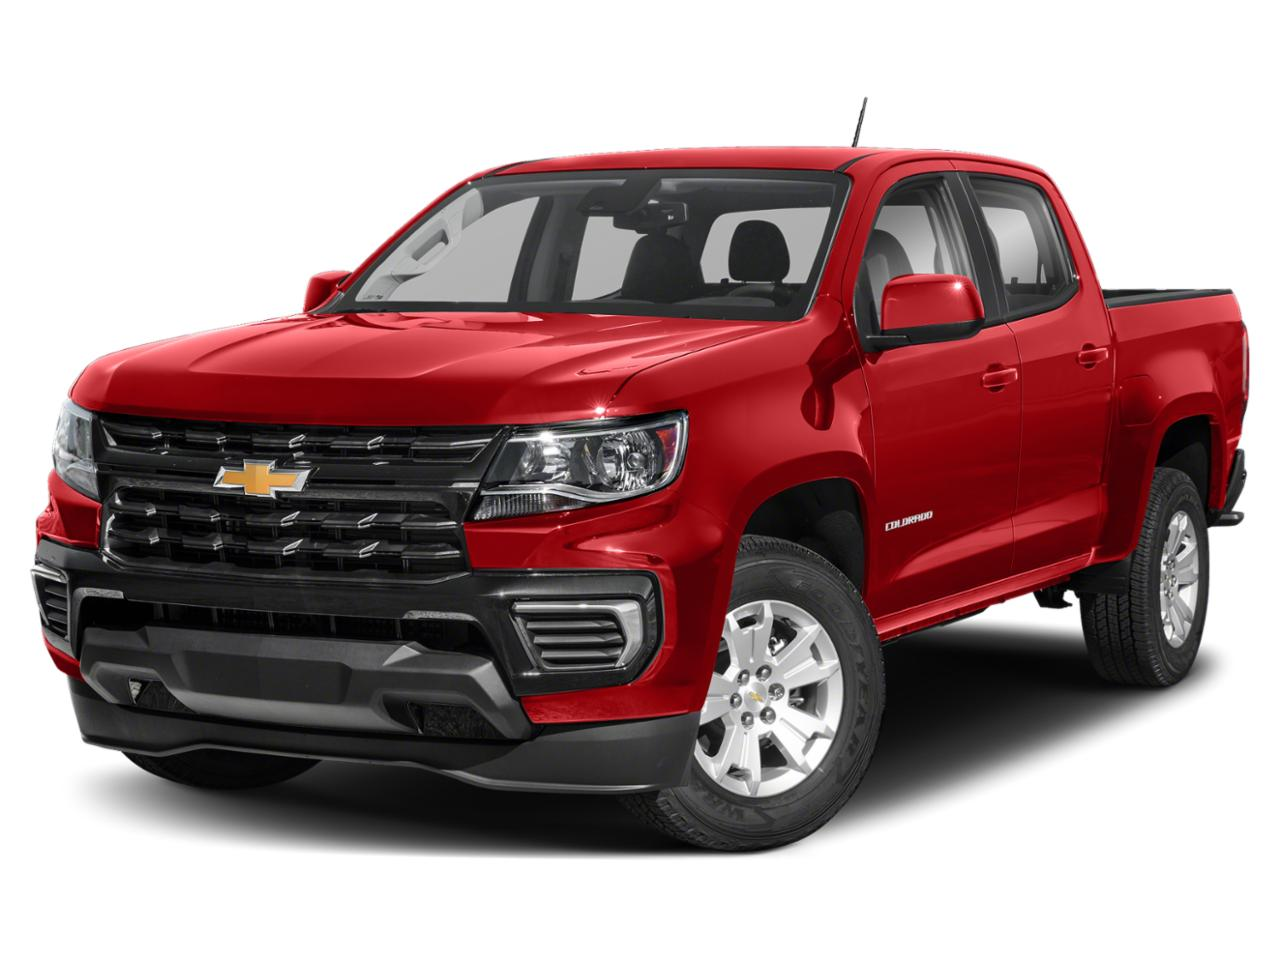 2021 Chevrolet Colorado Vehicle Photo in Greeley, CO 80634